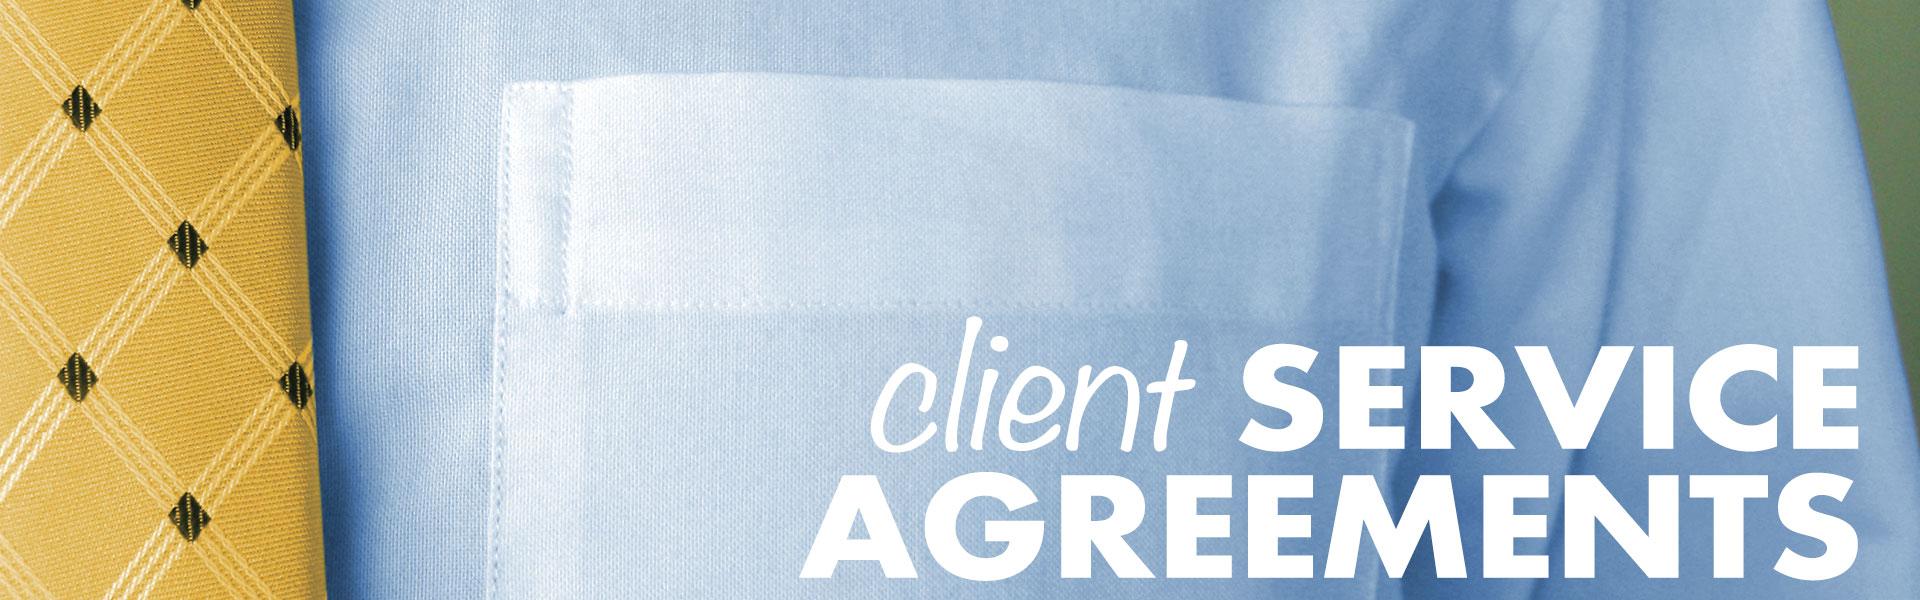 Canvas Legal Client Services Agreement Key Provisions